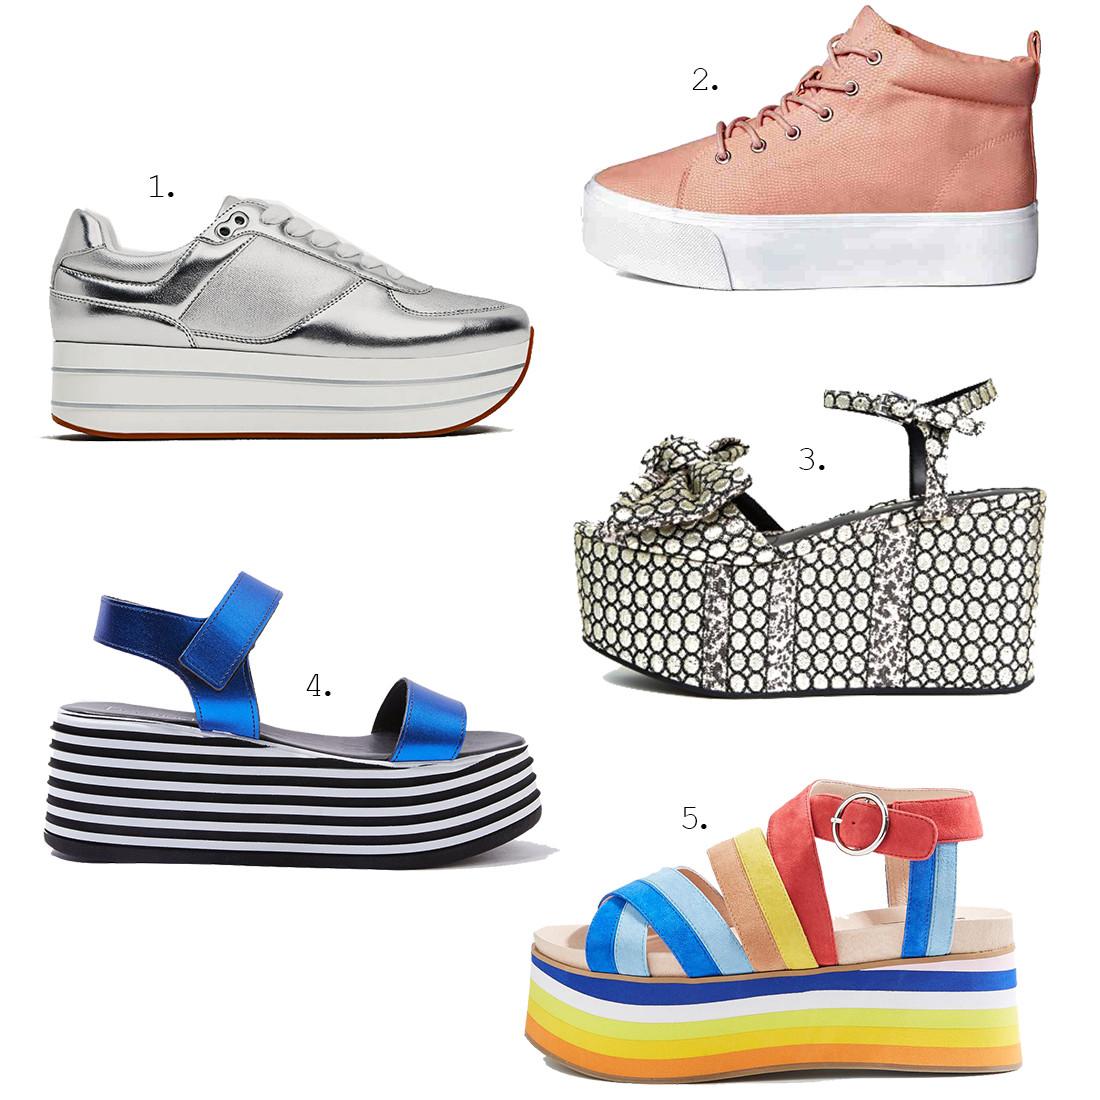 Обувь весна 2017 тенденции женские